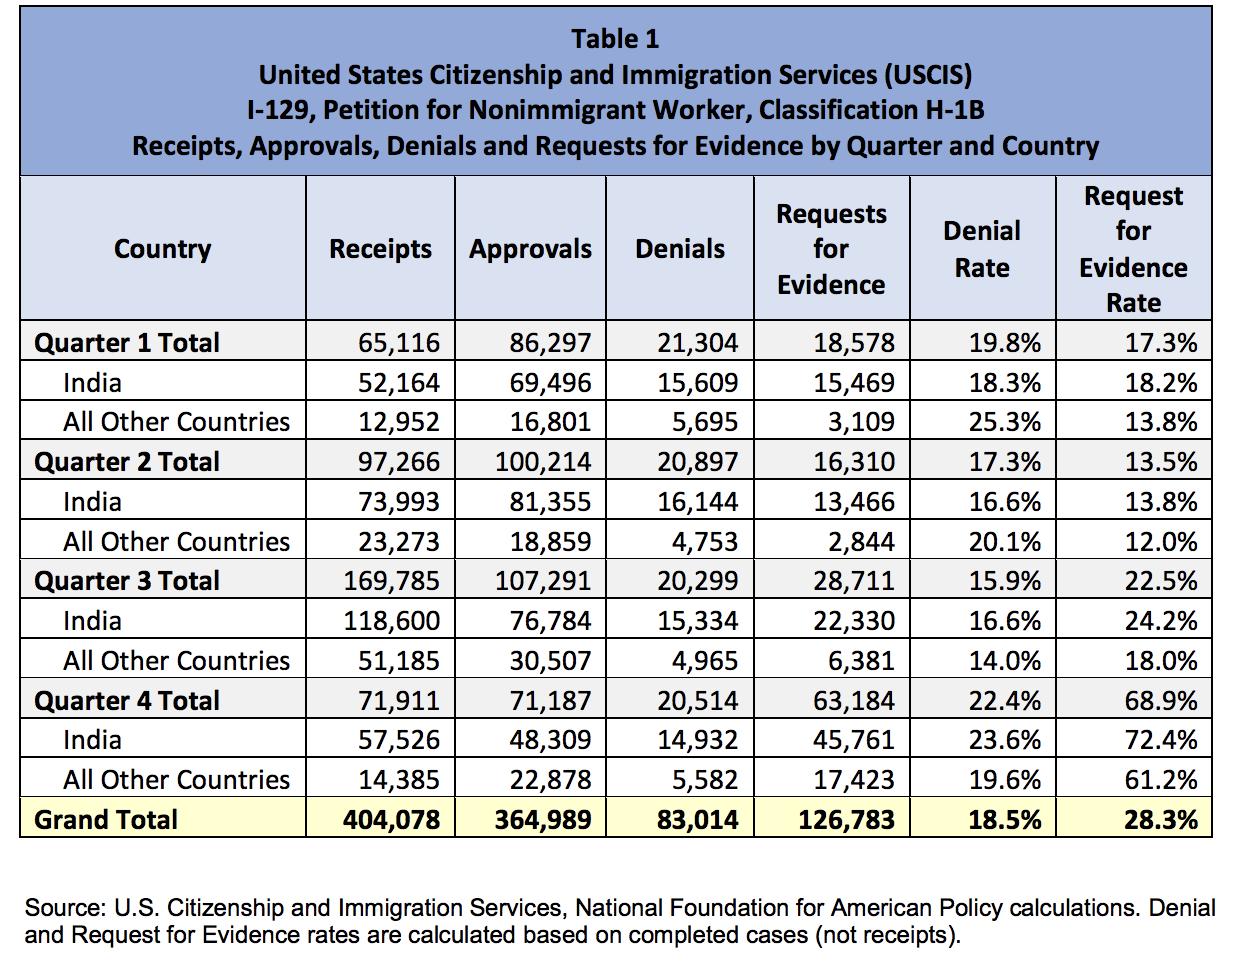 USCIS Data Signals Dramatic Increase in H-1B Visa Denials